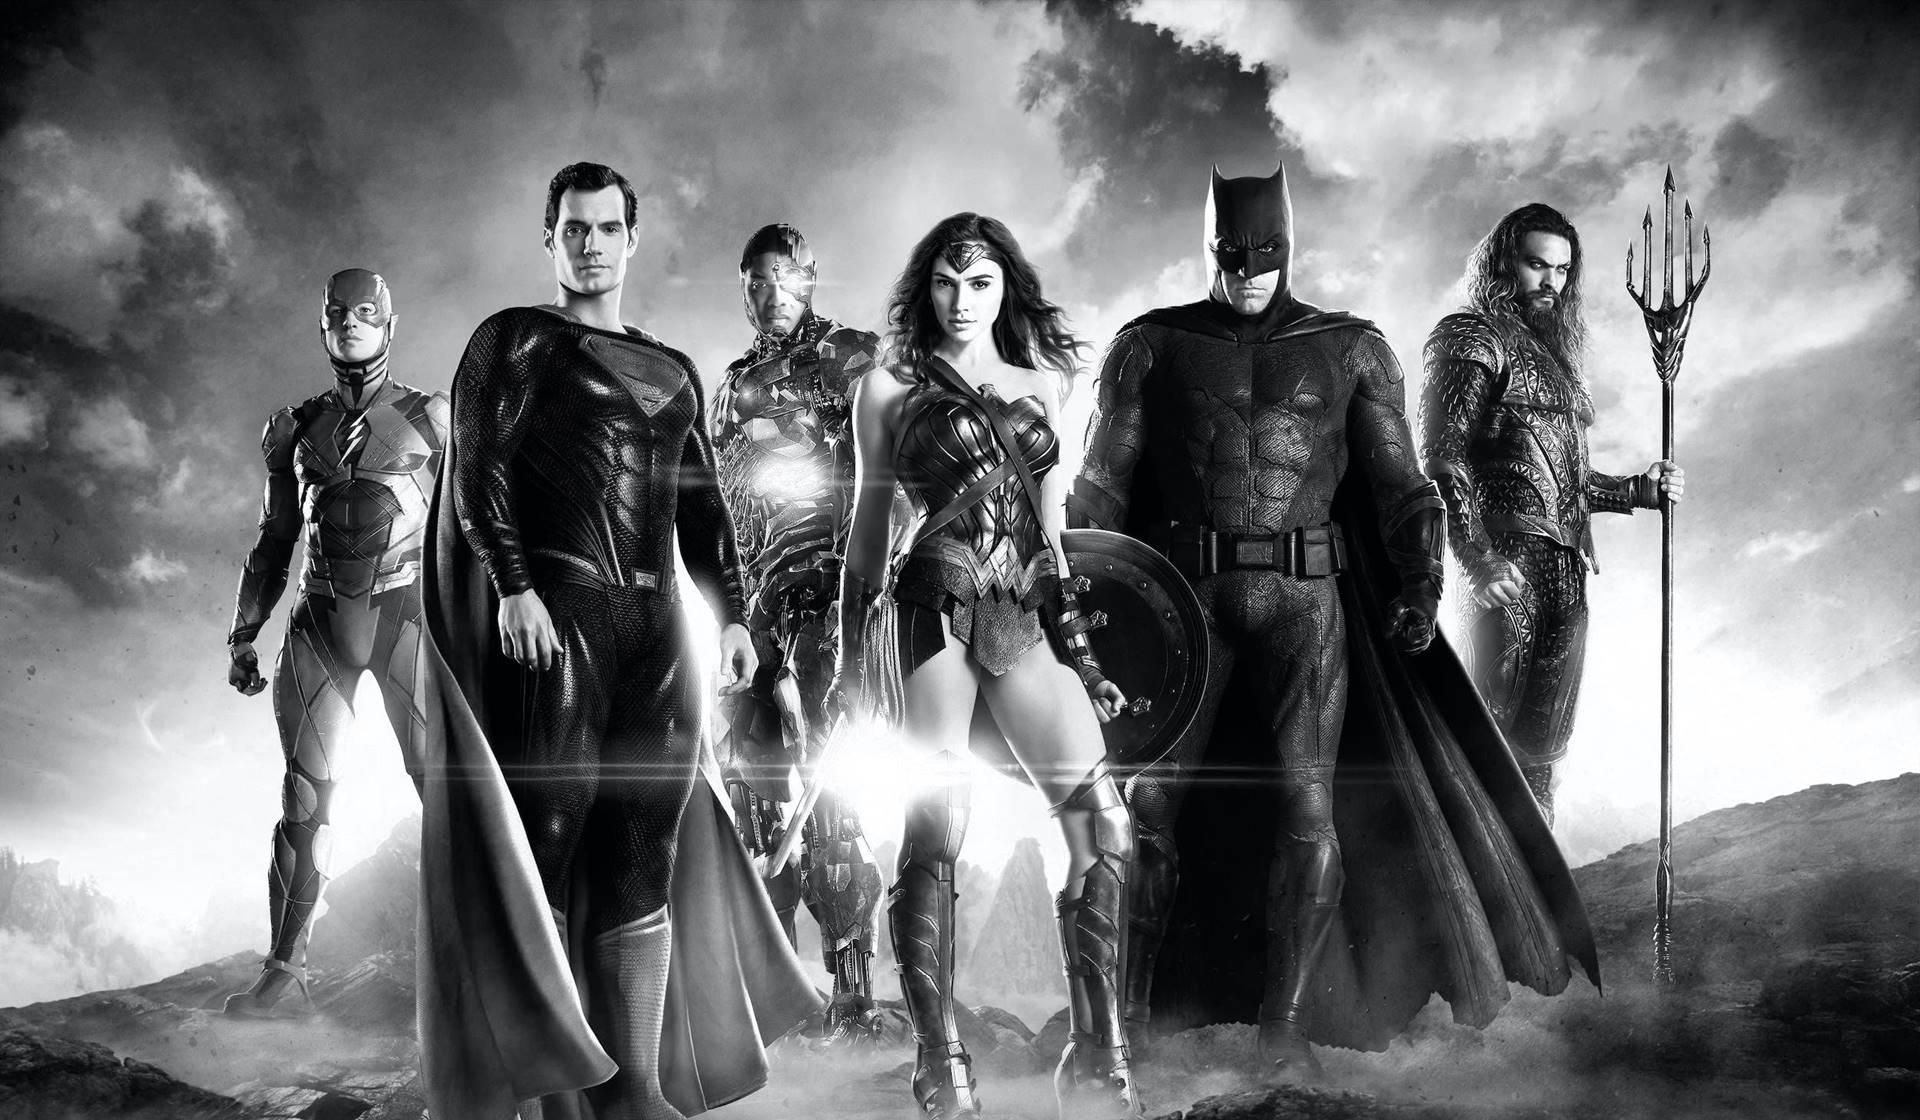 'La Liga de la Justicia de Zack Snyder'. Se hizo justicia.